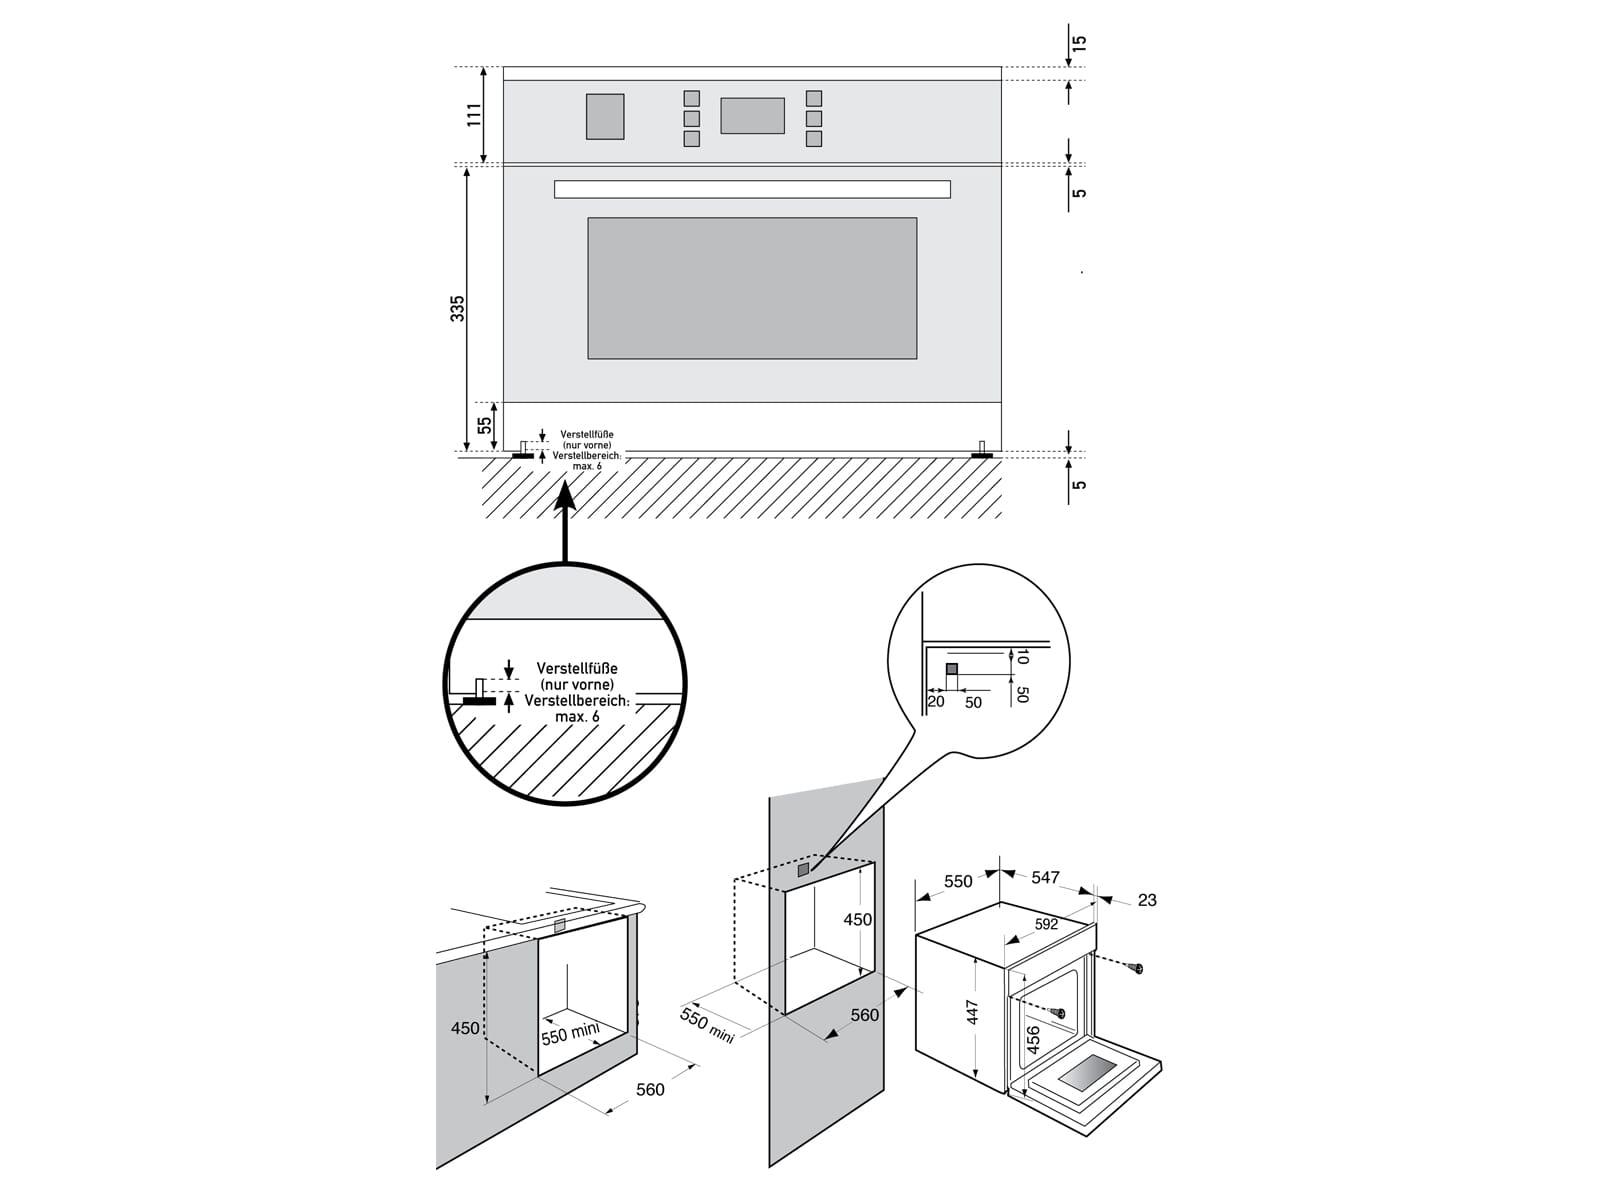 Oranier KMH 9803 12 - 9803 12 Kompakt-Backofen mit Mikrowelle Edelstahl/Schwarz